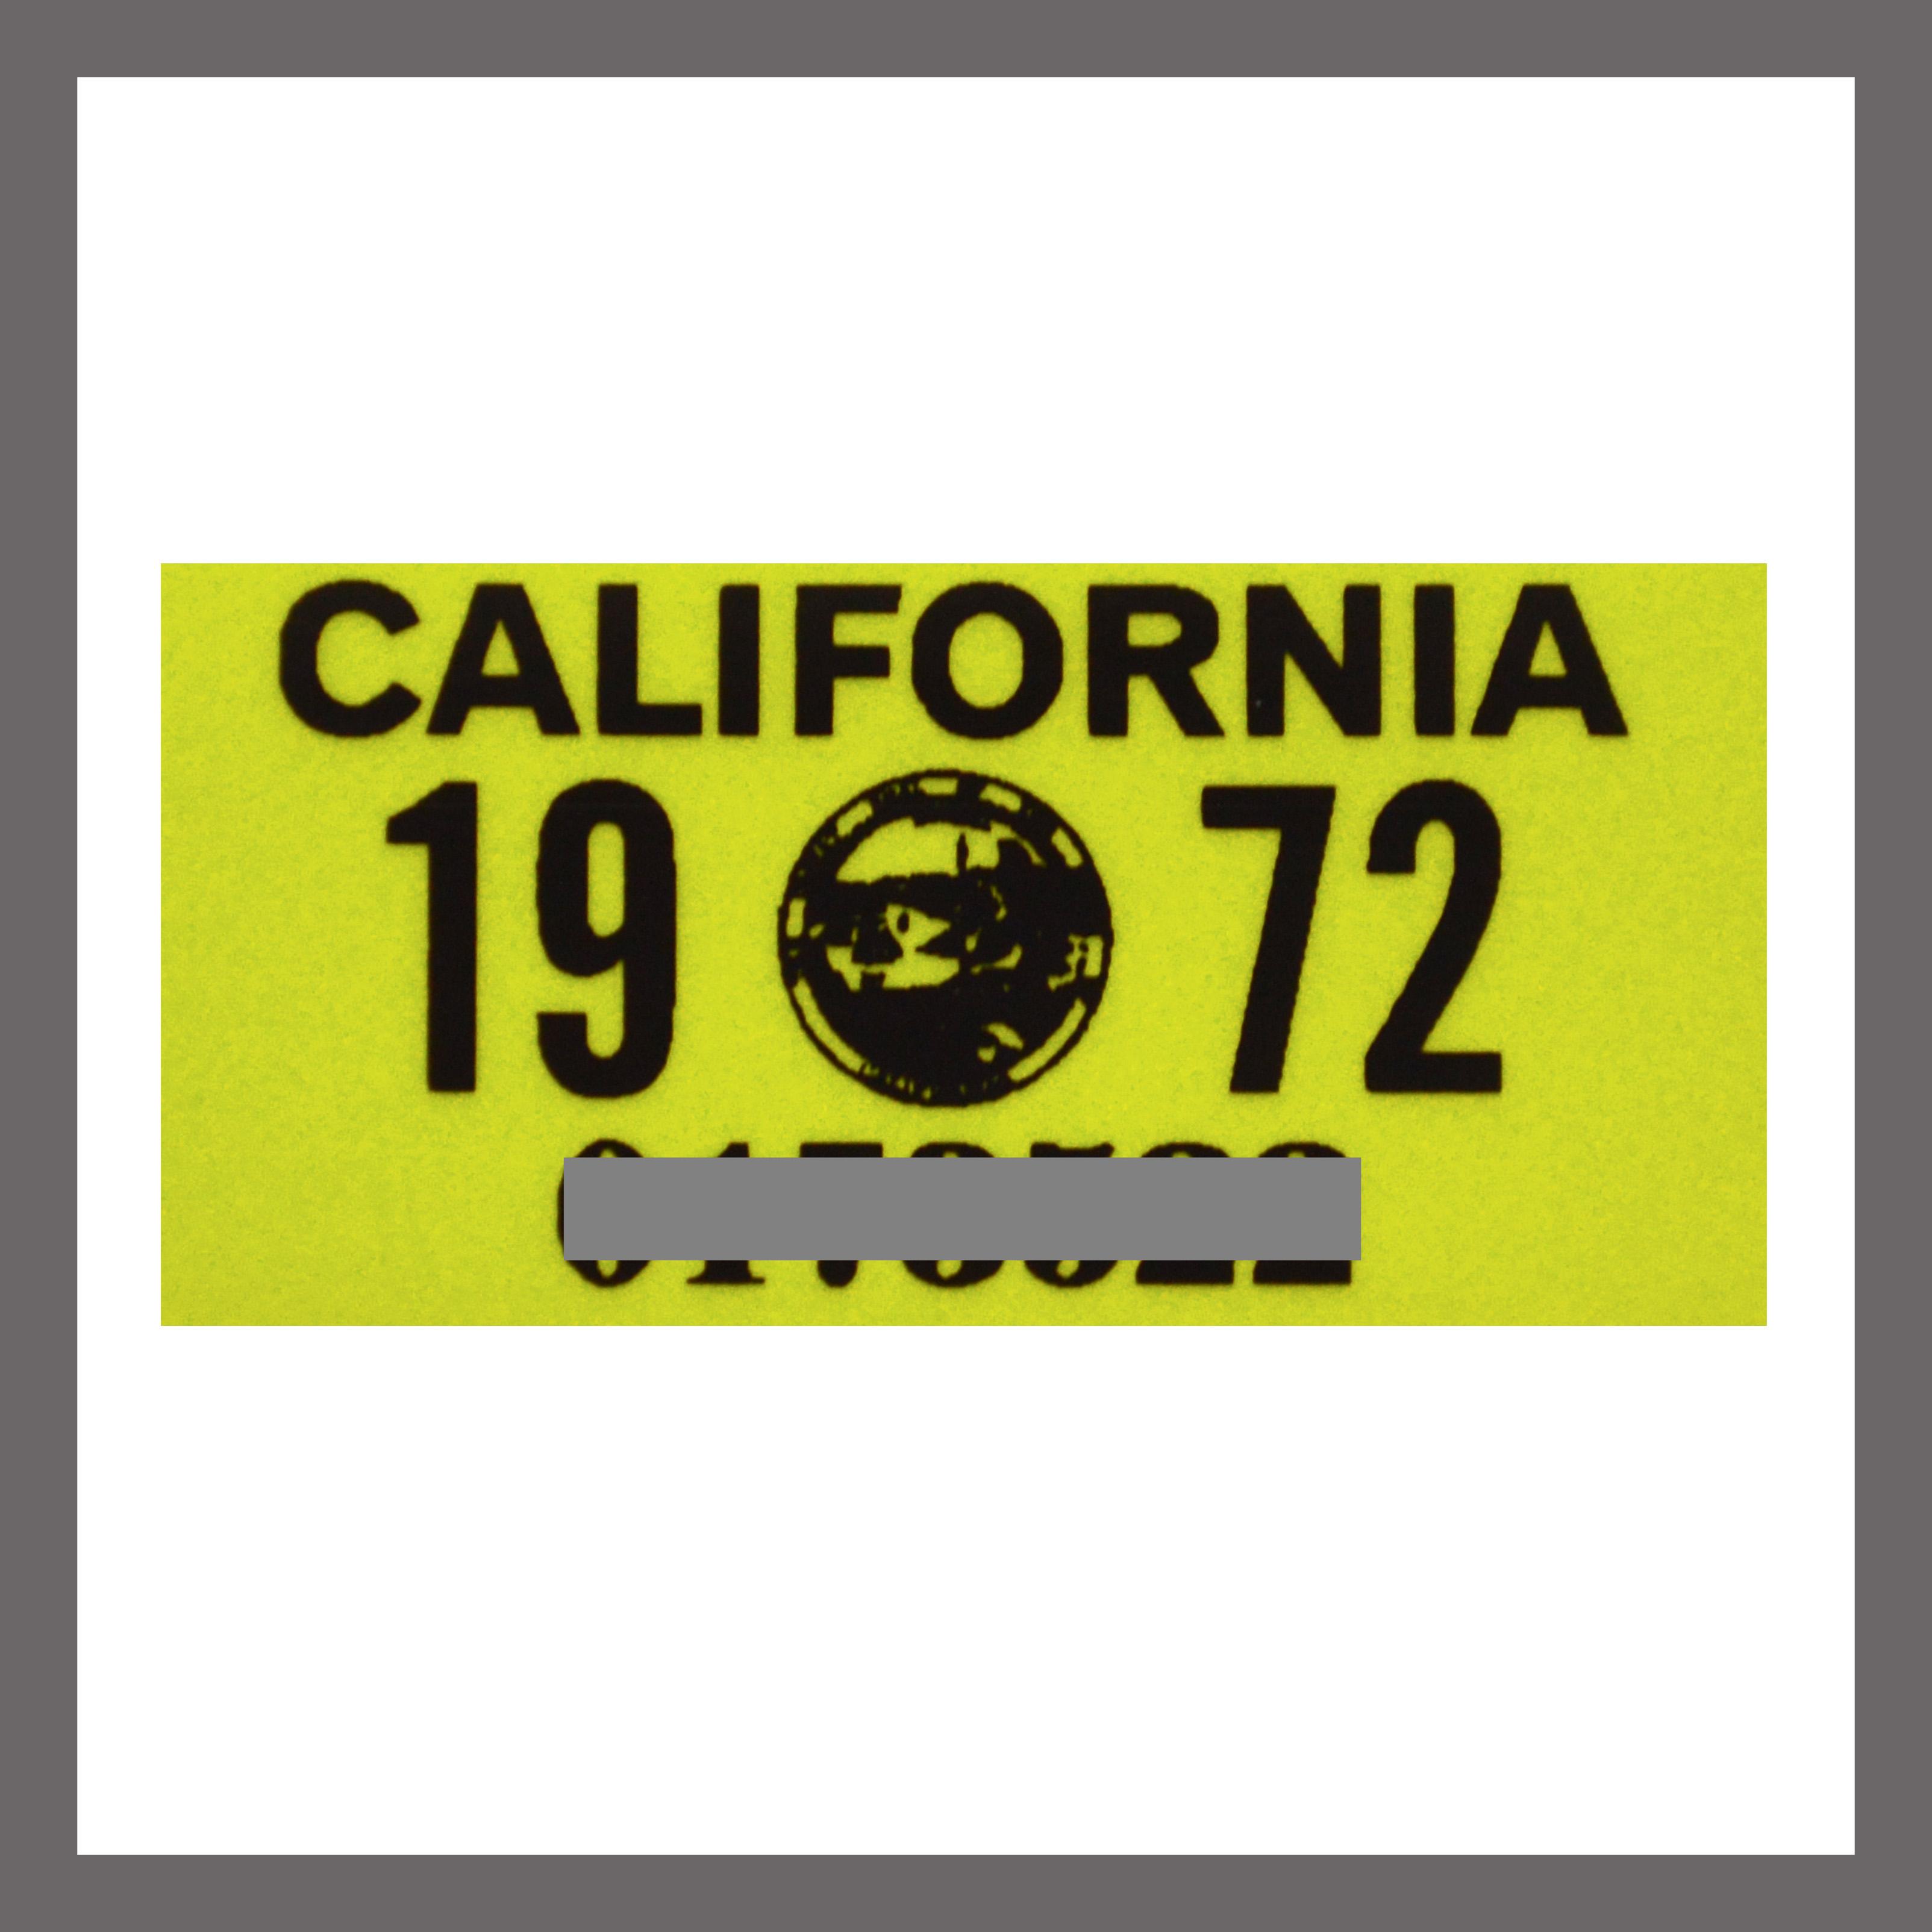 Codes: Codes Tree - Vehicle Code - VEH - California